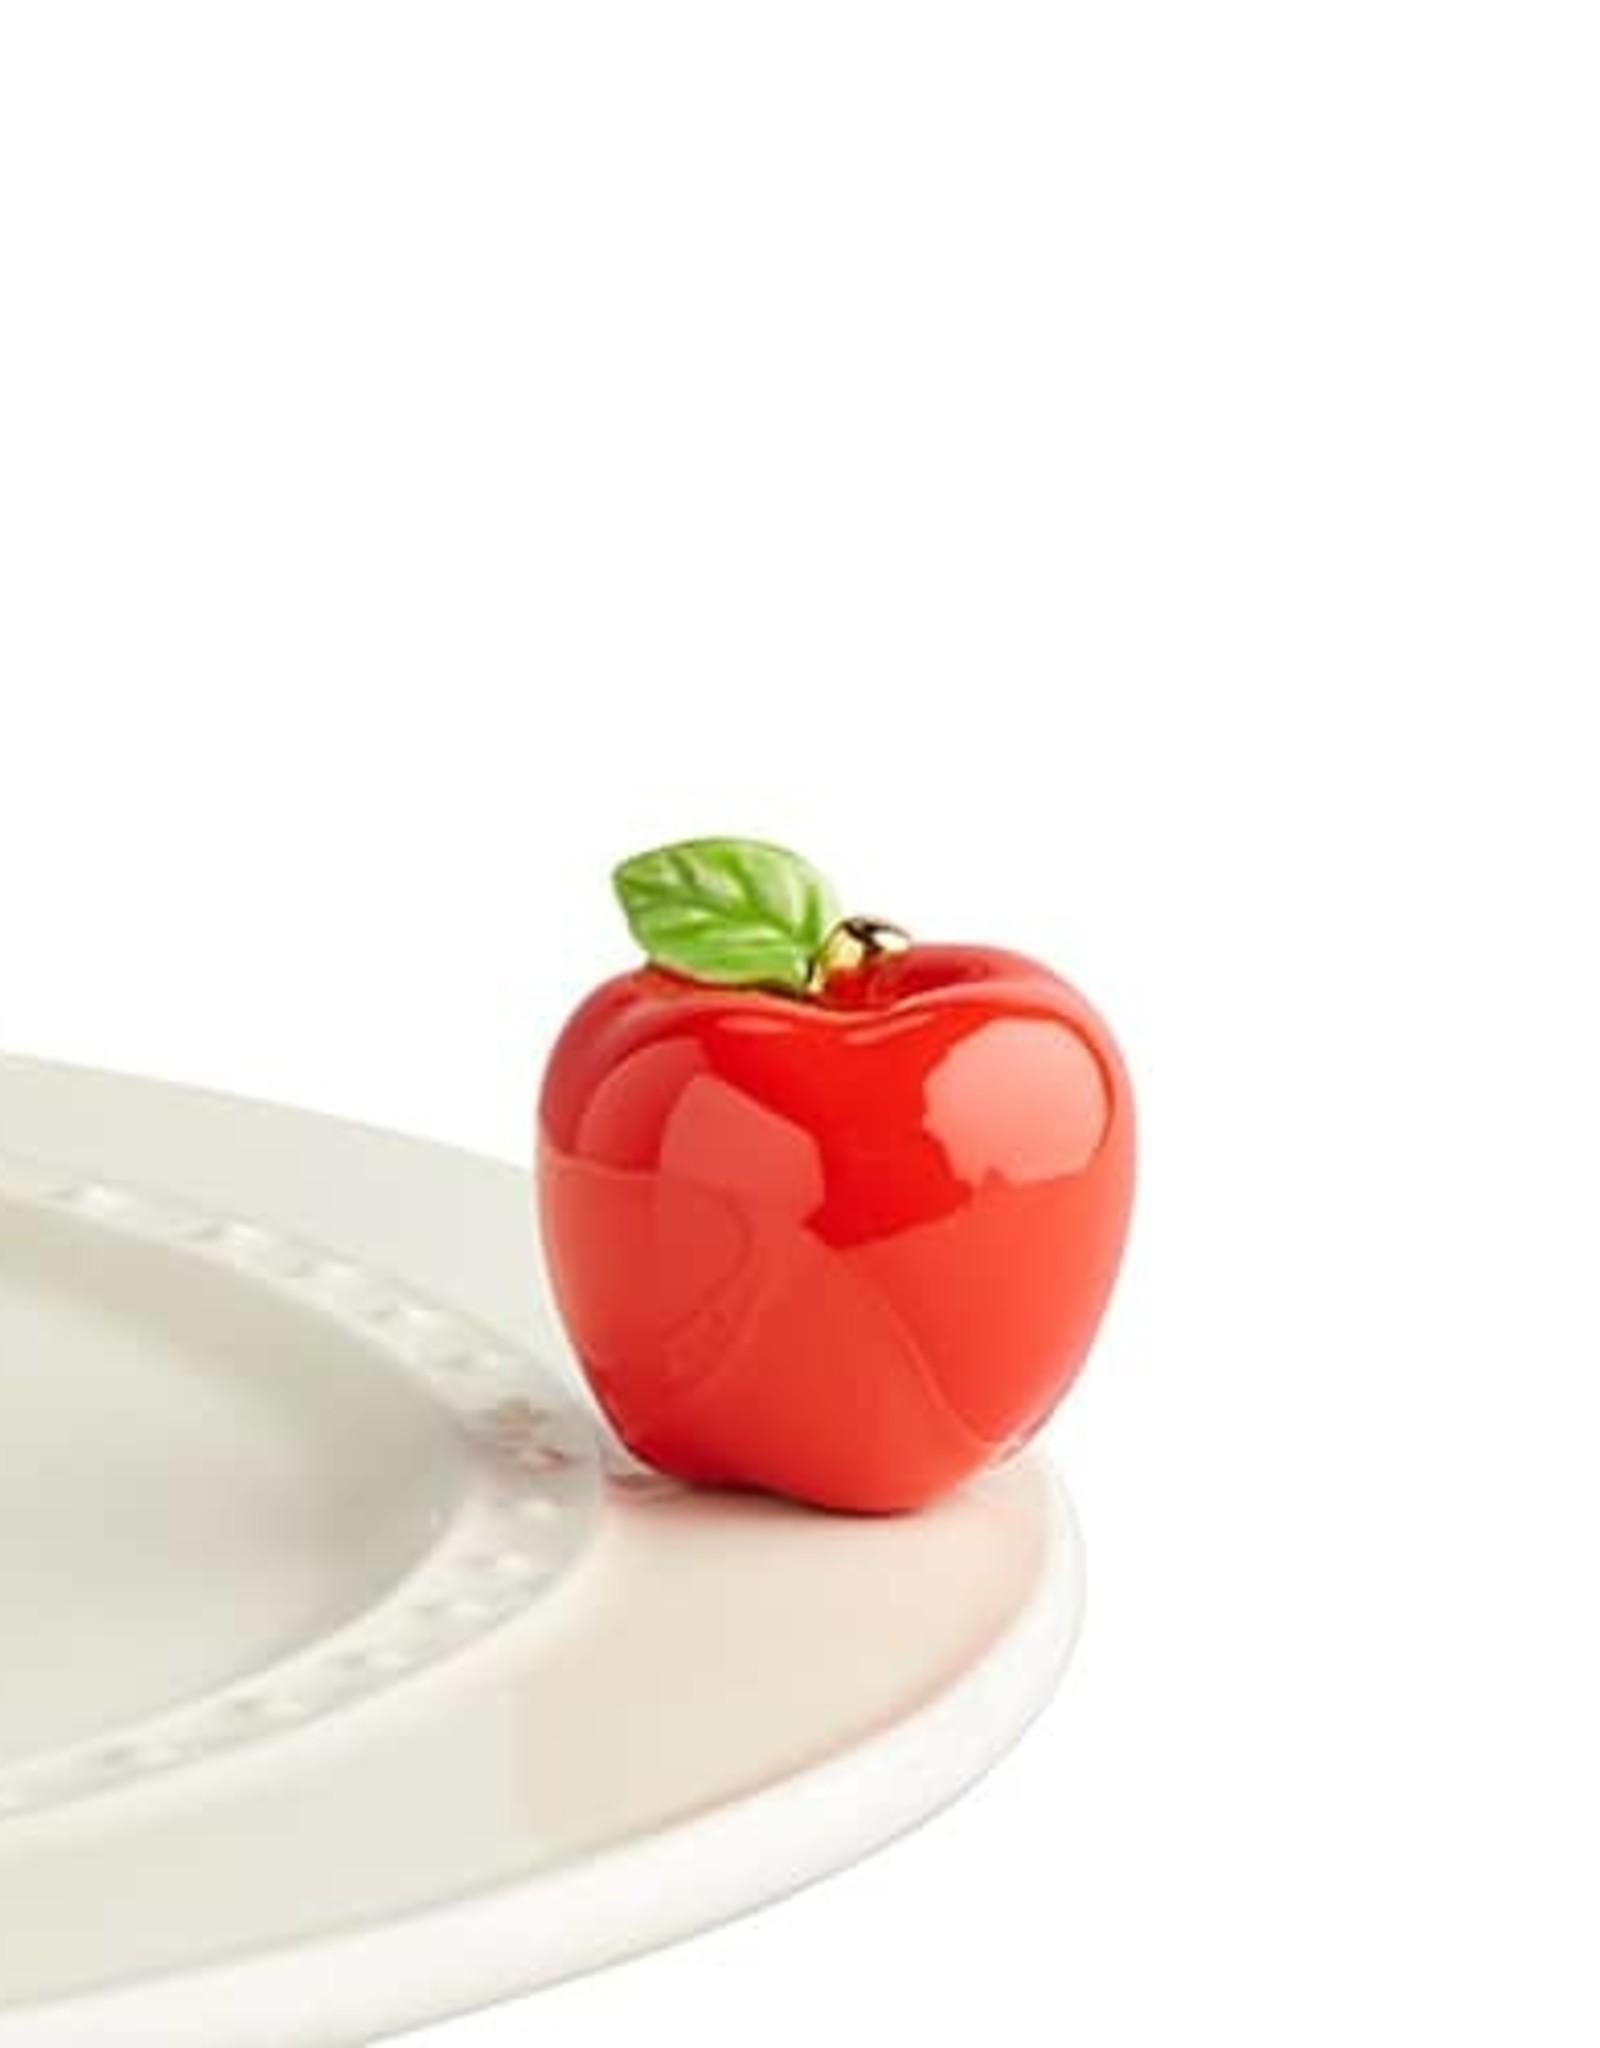 Nora Fleming A97 An Apple a day